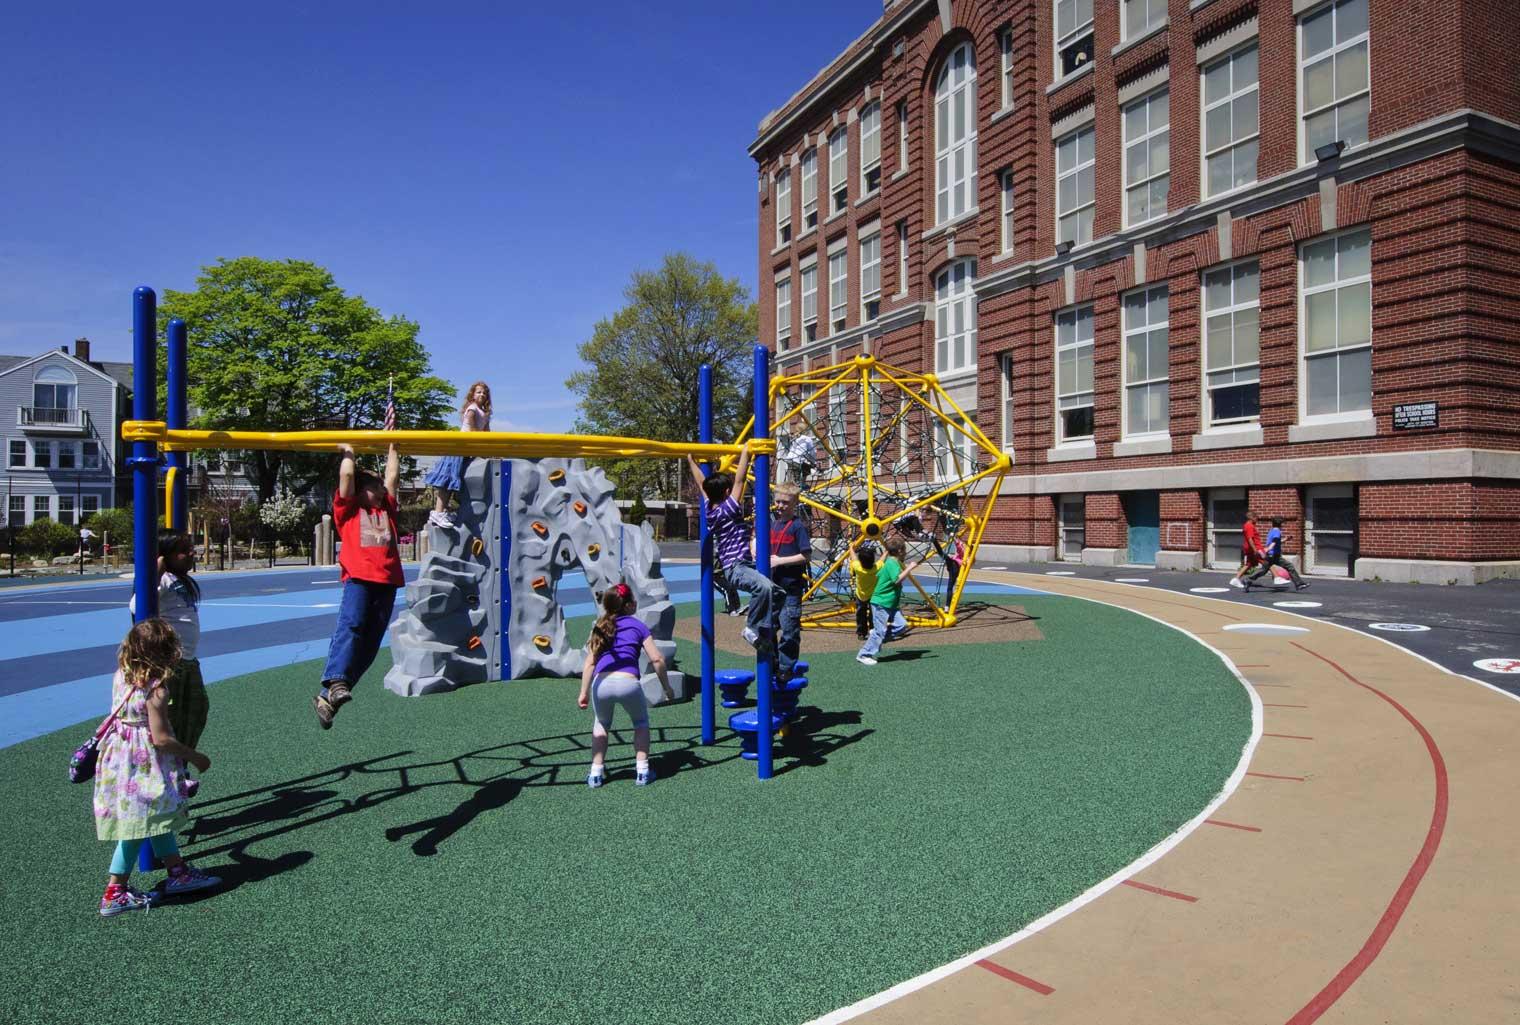 Oliver Hazard Perry Schoolyard